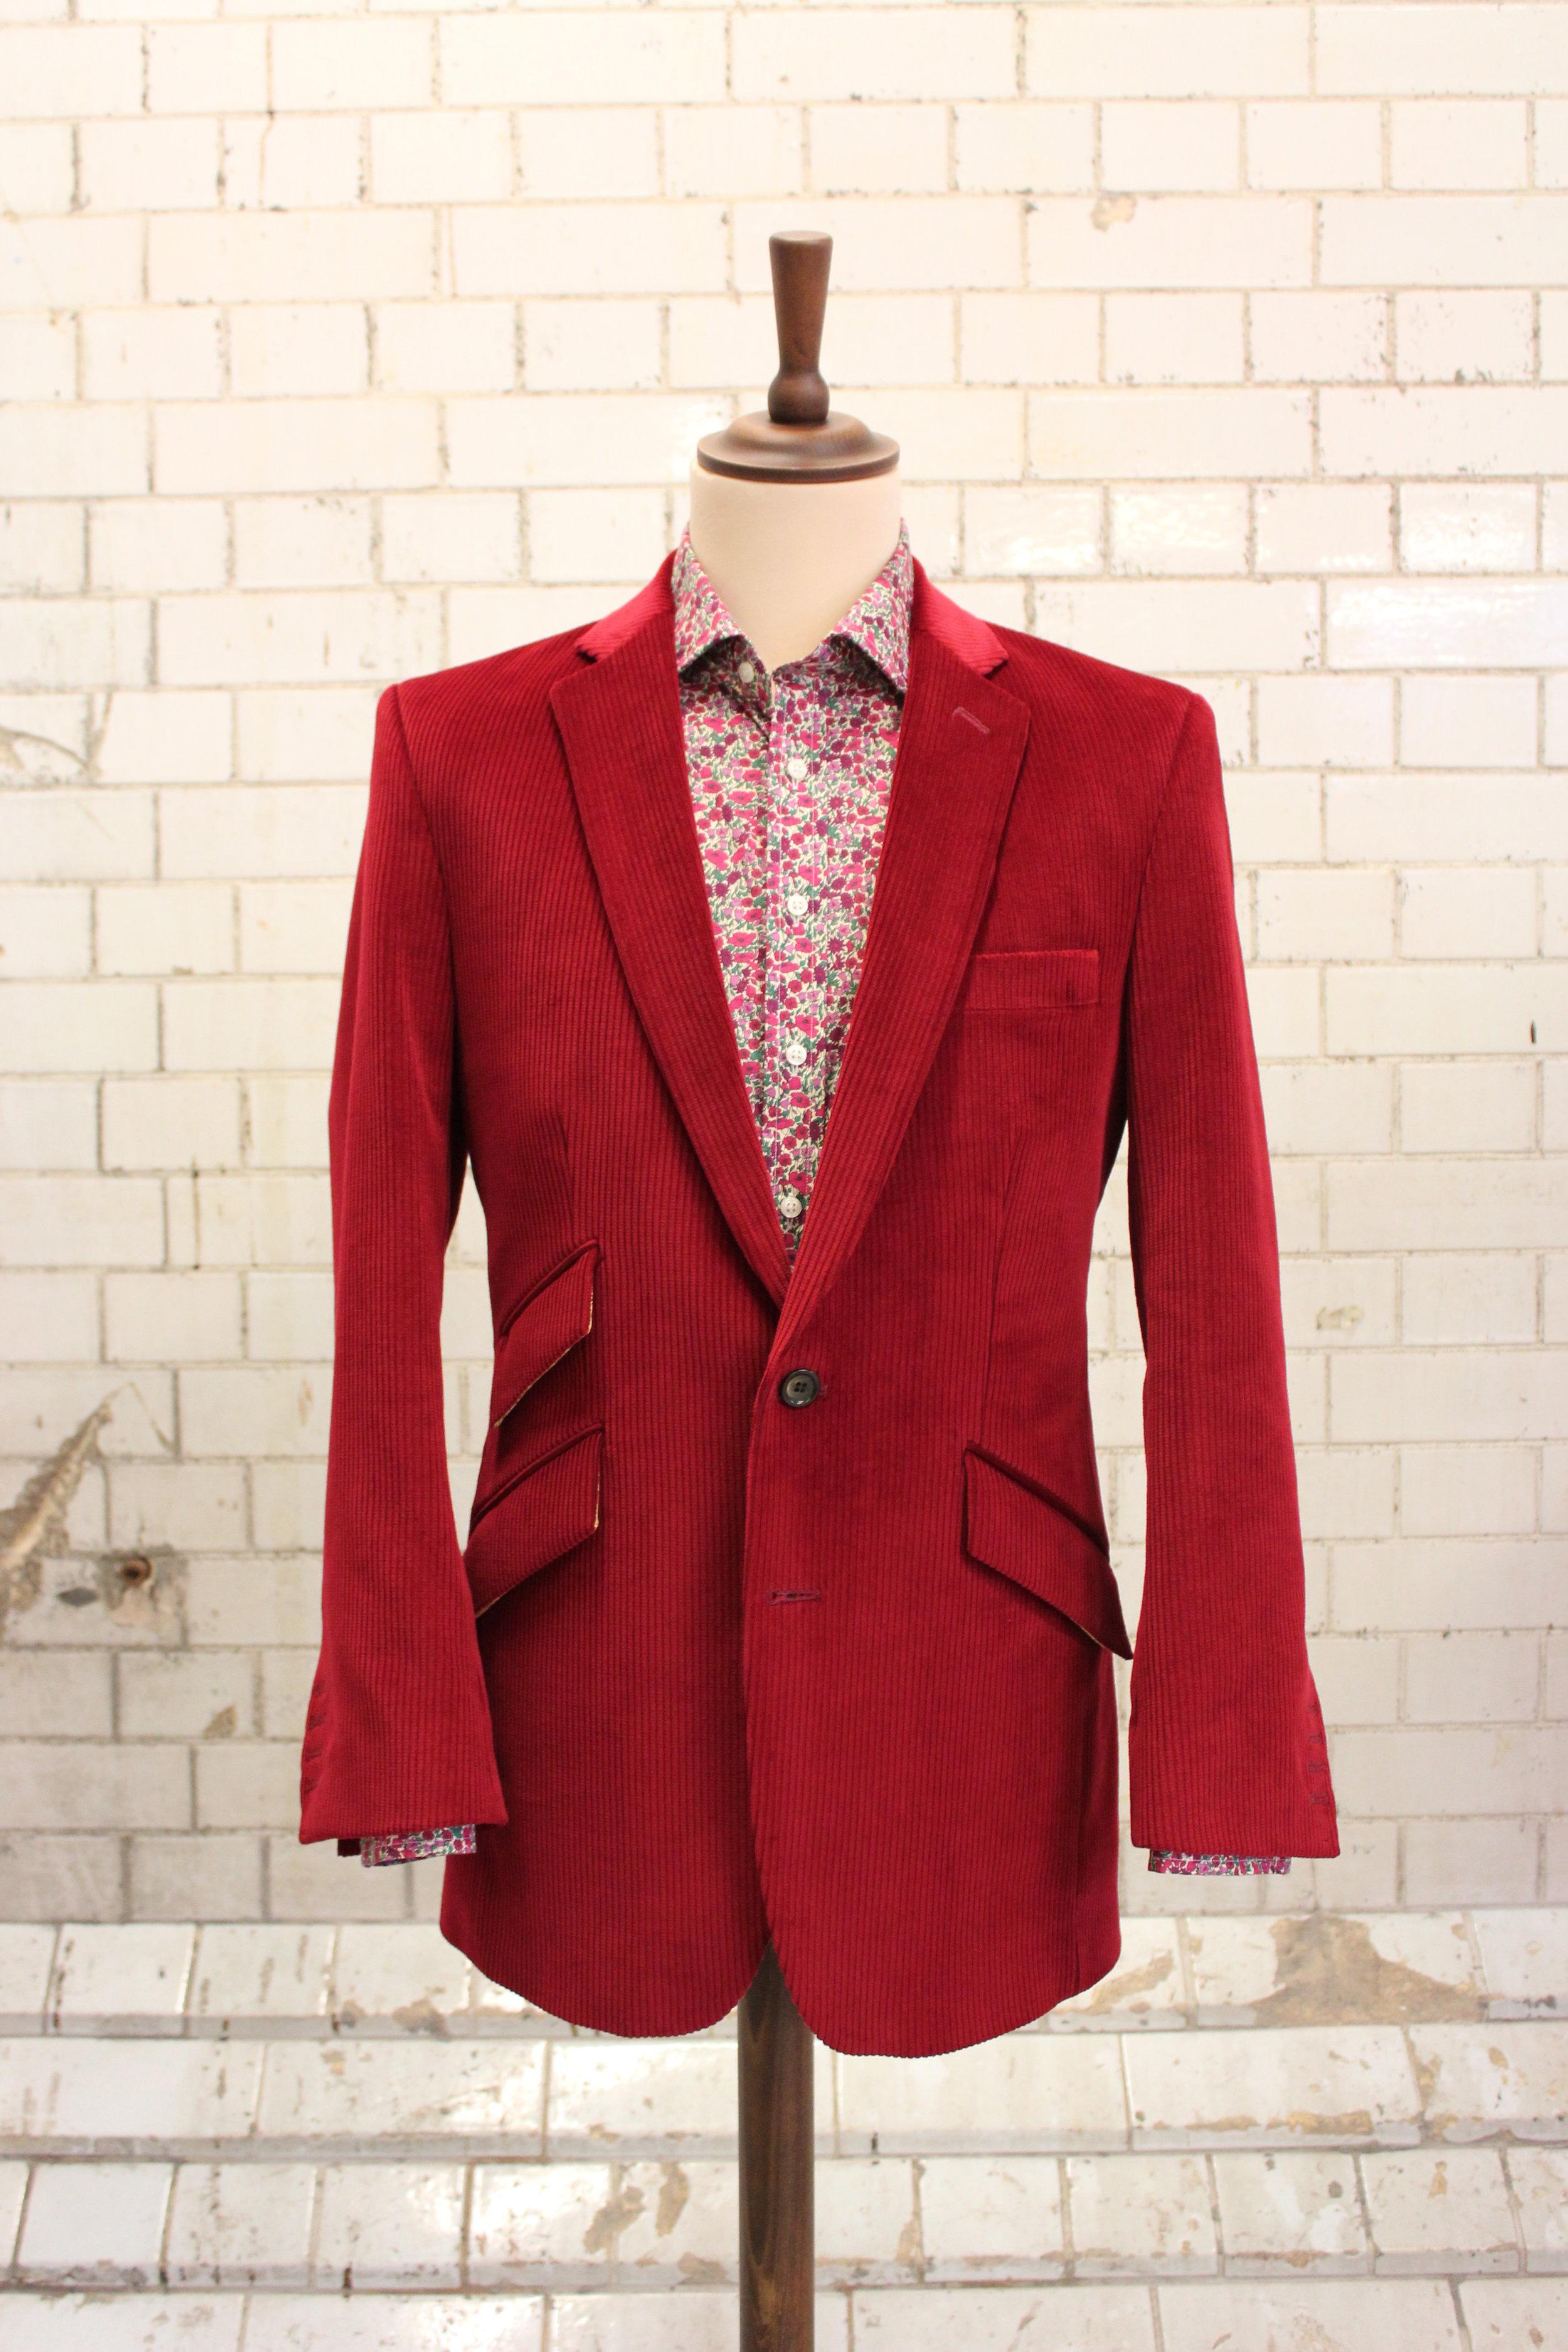 red-cord-dugdale-liberty-print-british-all-uk-made-cord-menswear-suit-shirt.JPG